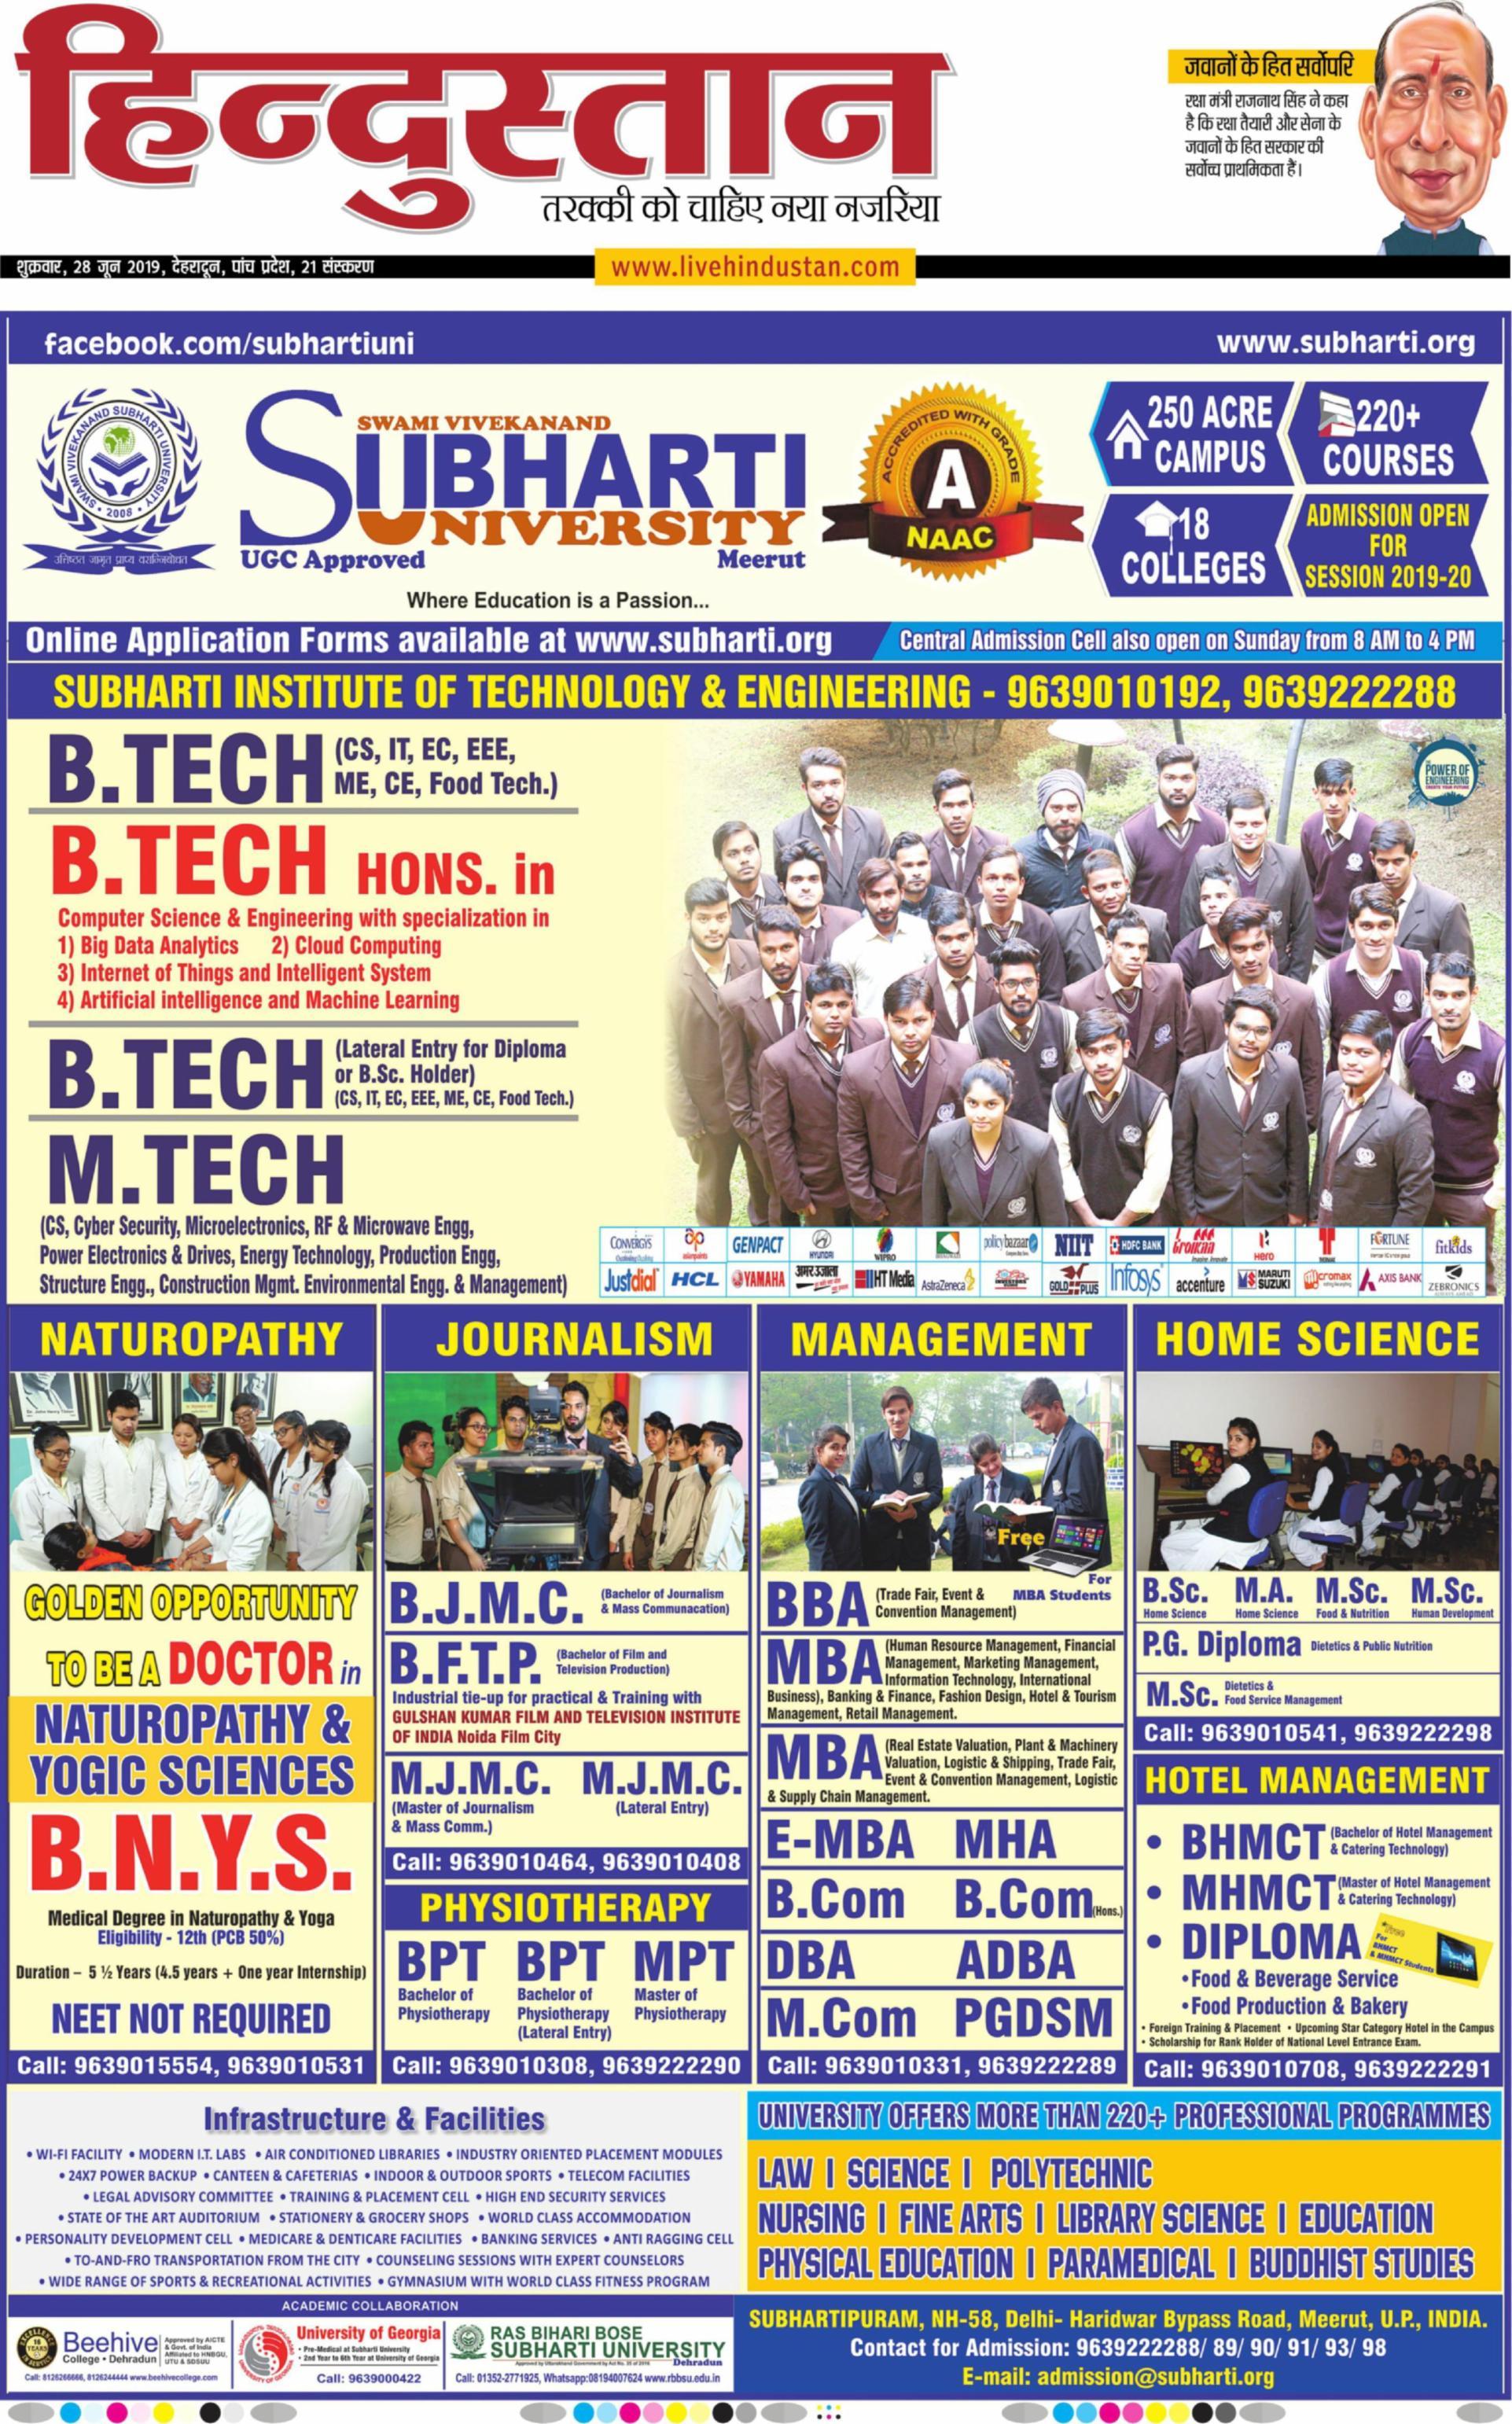 Hindustan Times Hindi Dehradun - June 28, 2019 Digital Magazine from